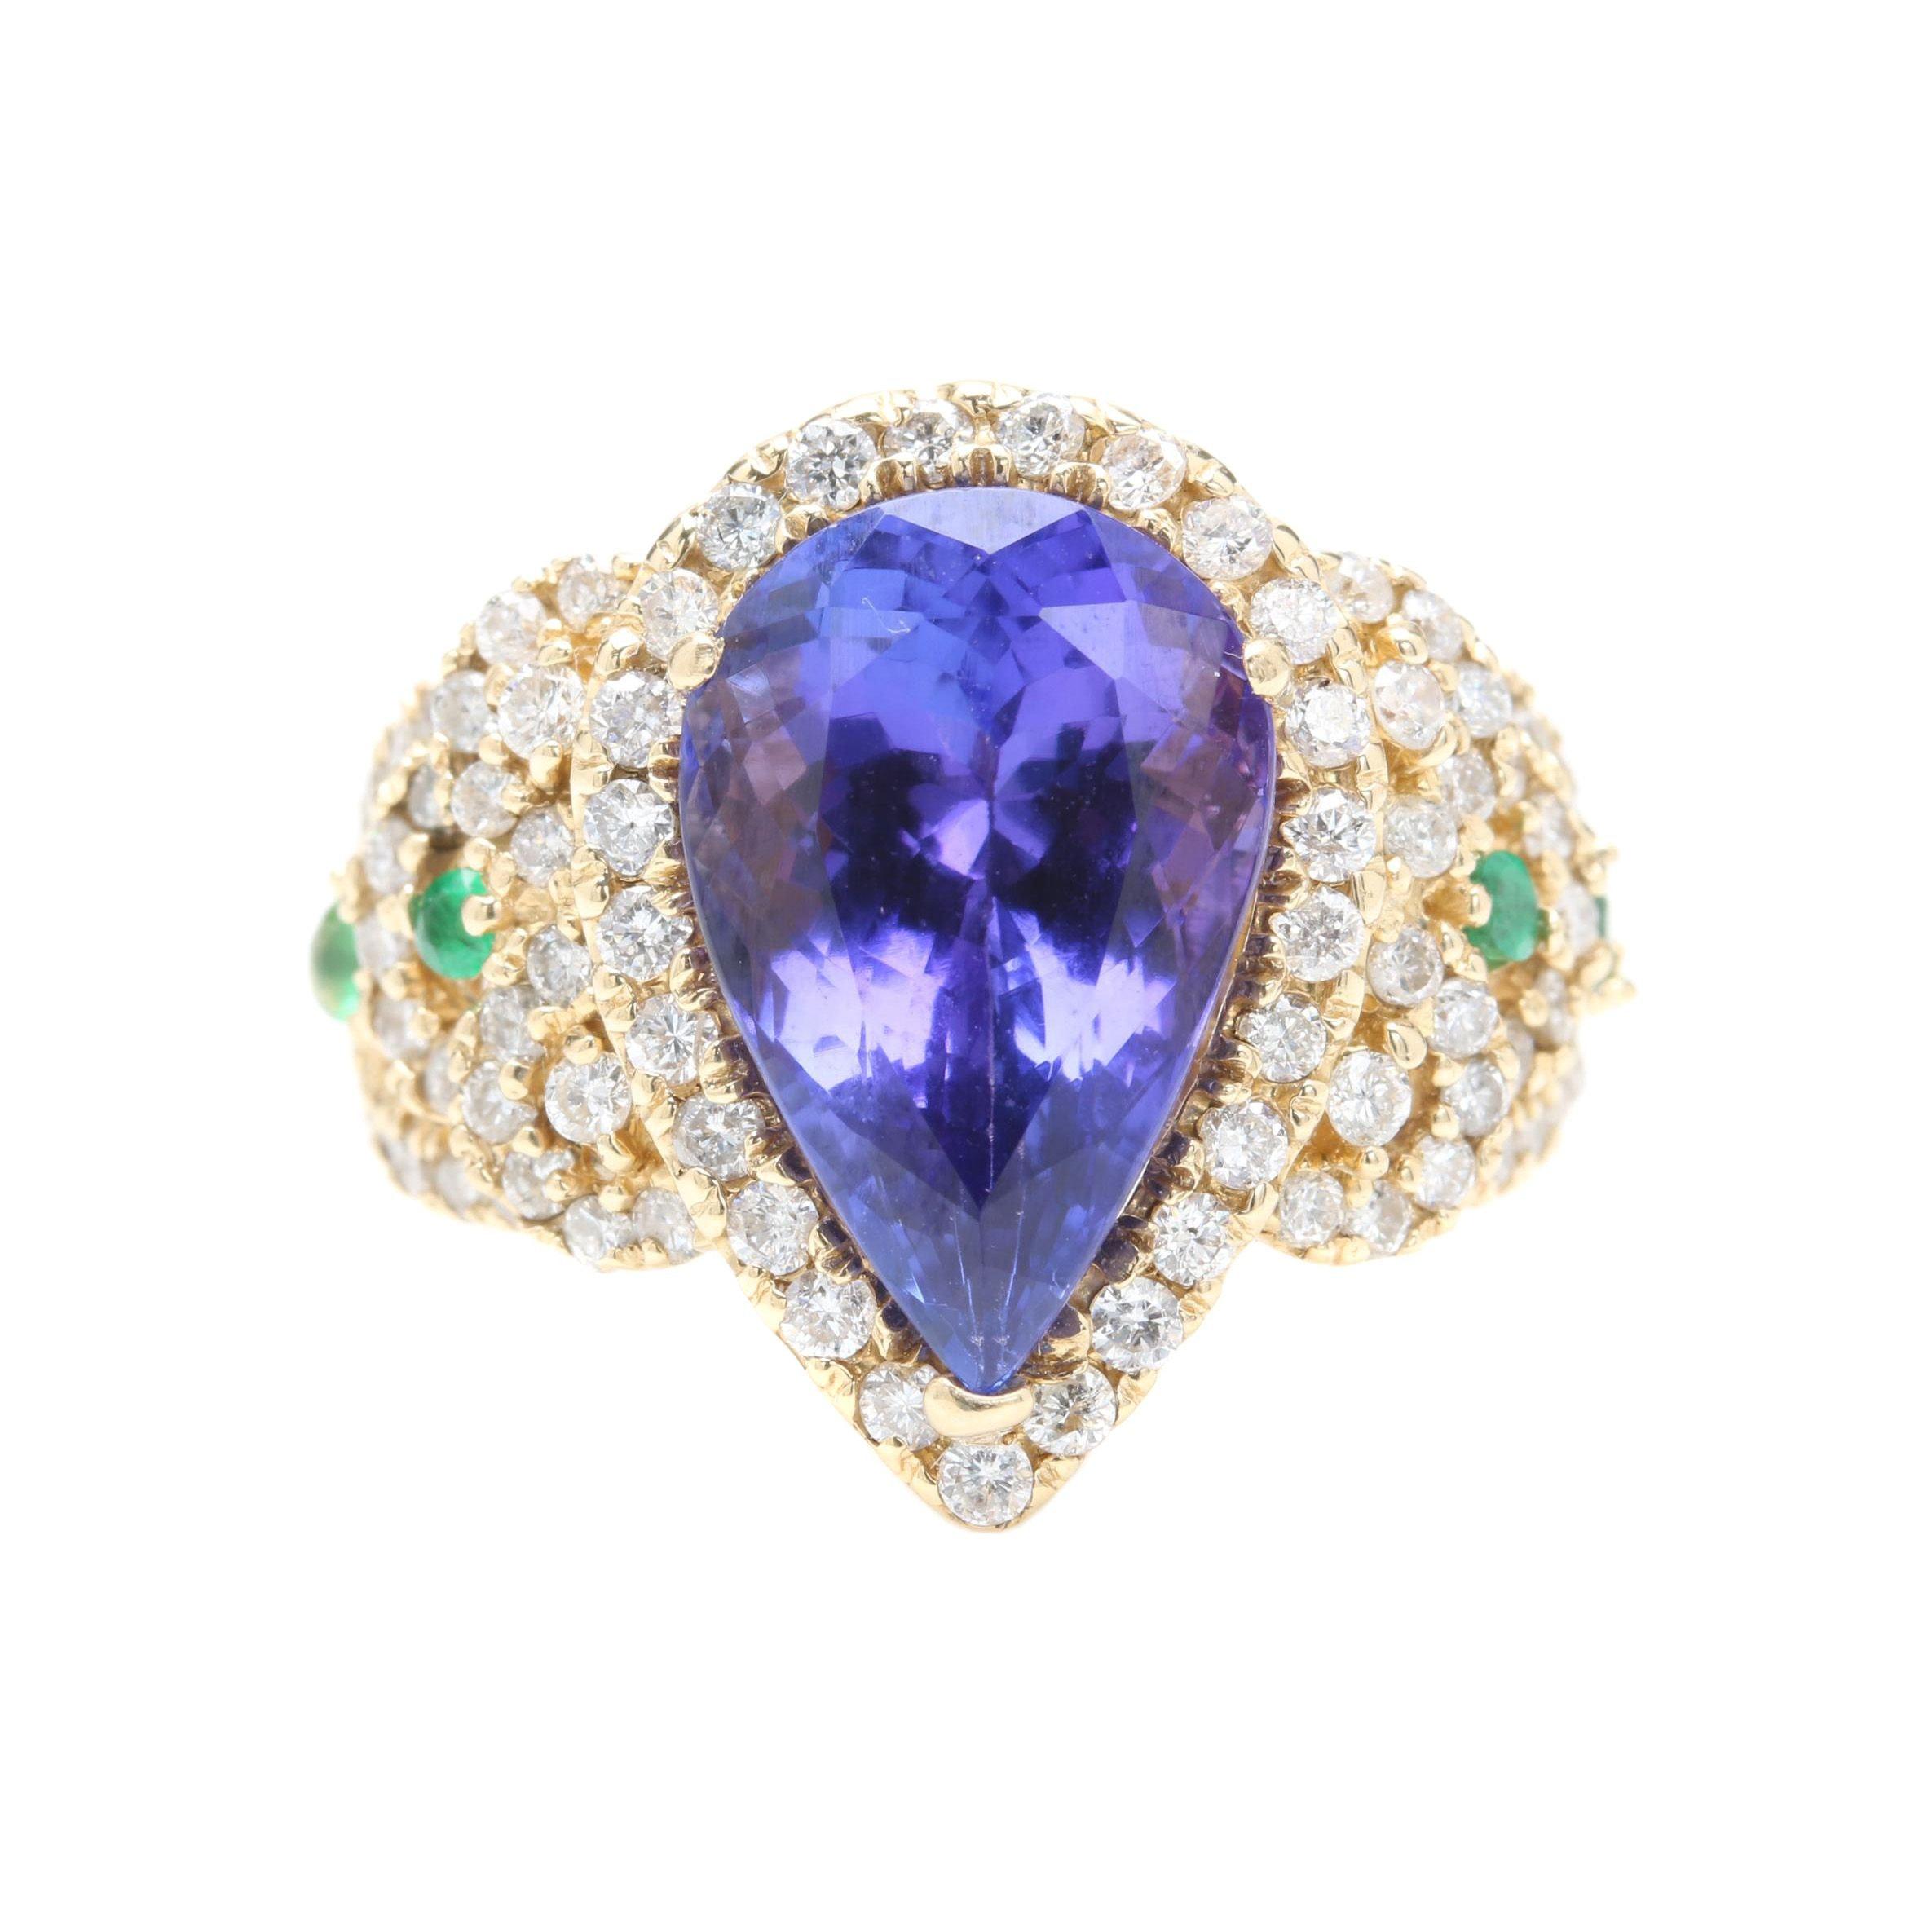 14K Yellow Gold 6.25 CT Tanzanite, Emerald, and 1.00 CTW Diamond Statement Ring